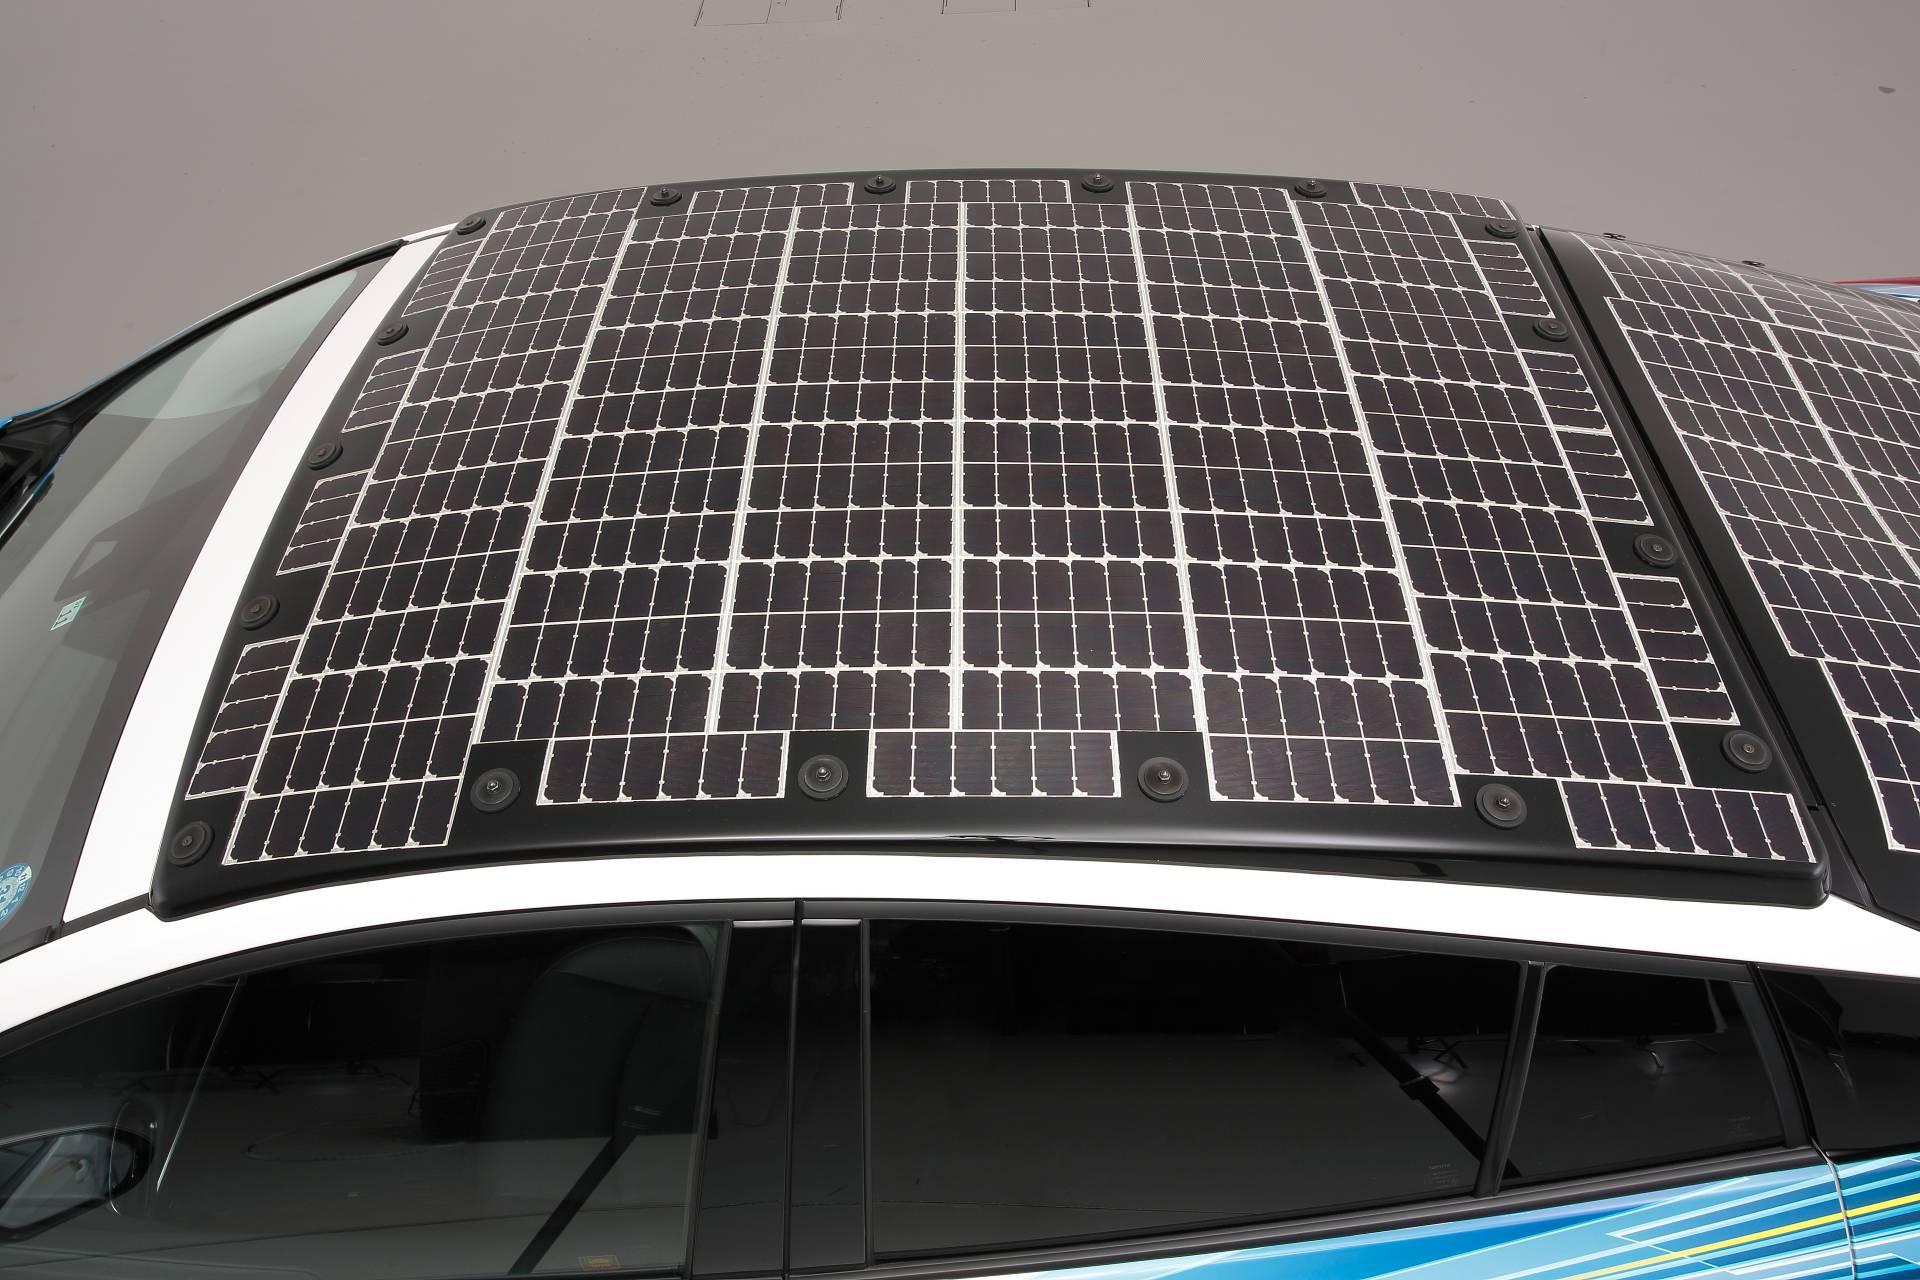 Toyota-Prius-Prime-With-Solar-Panels-12